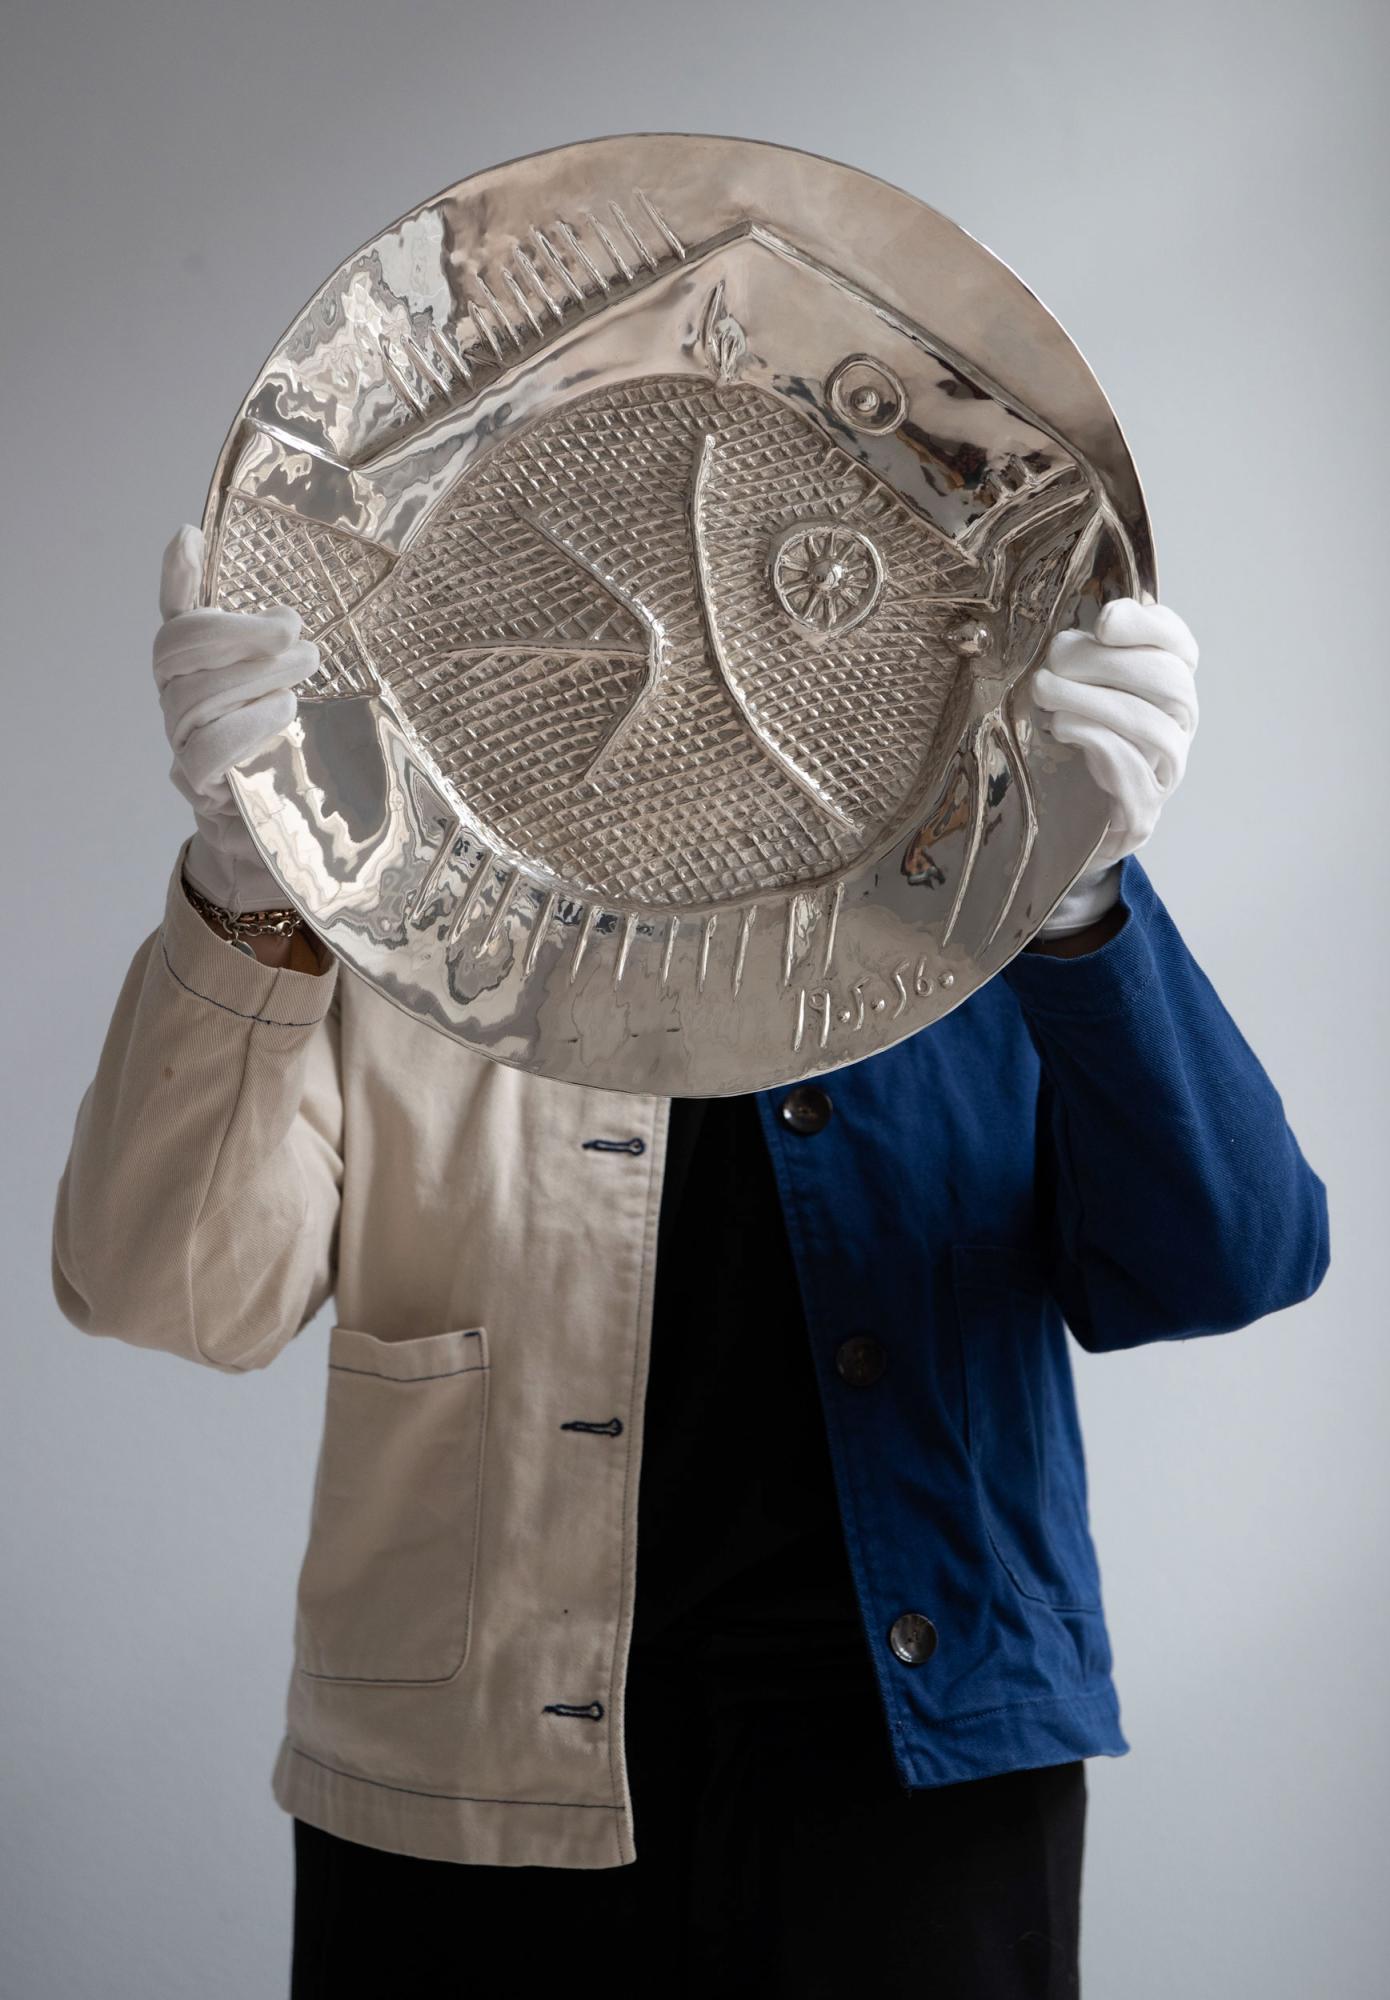 Pablo-Picasso,-A-Complete-set-of-24-silver-plates,-1956-1967,-est_-£1_2-1.jpg